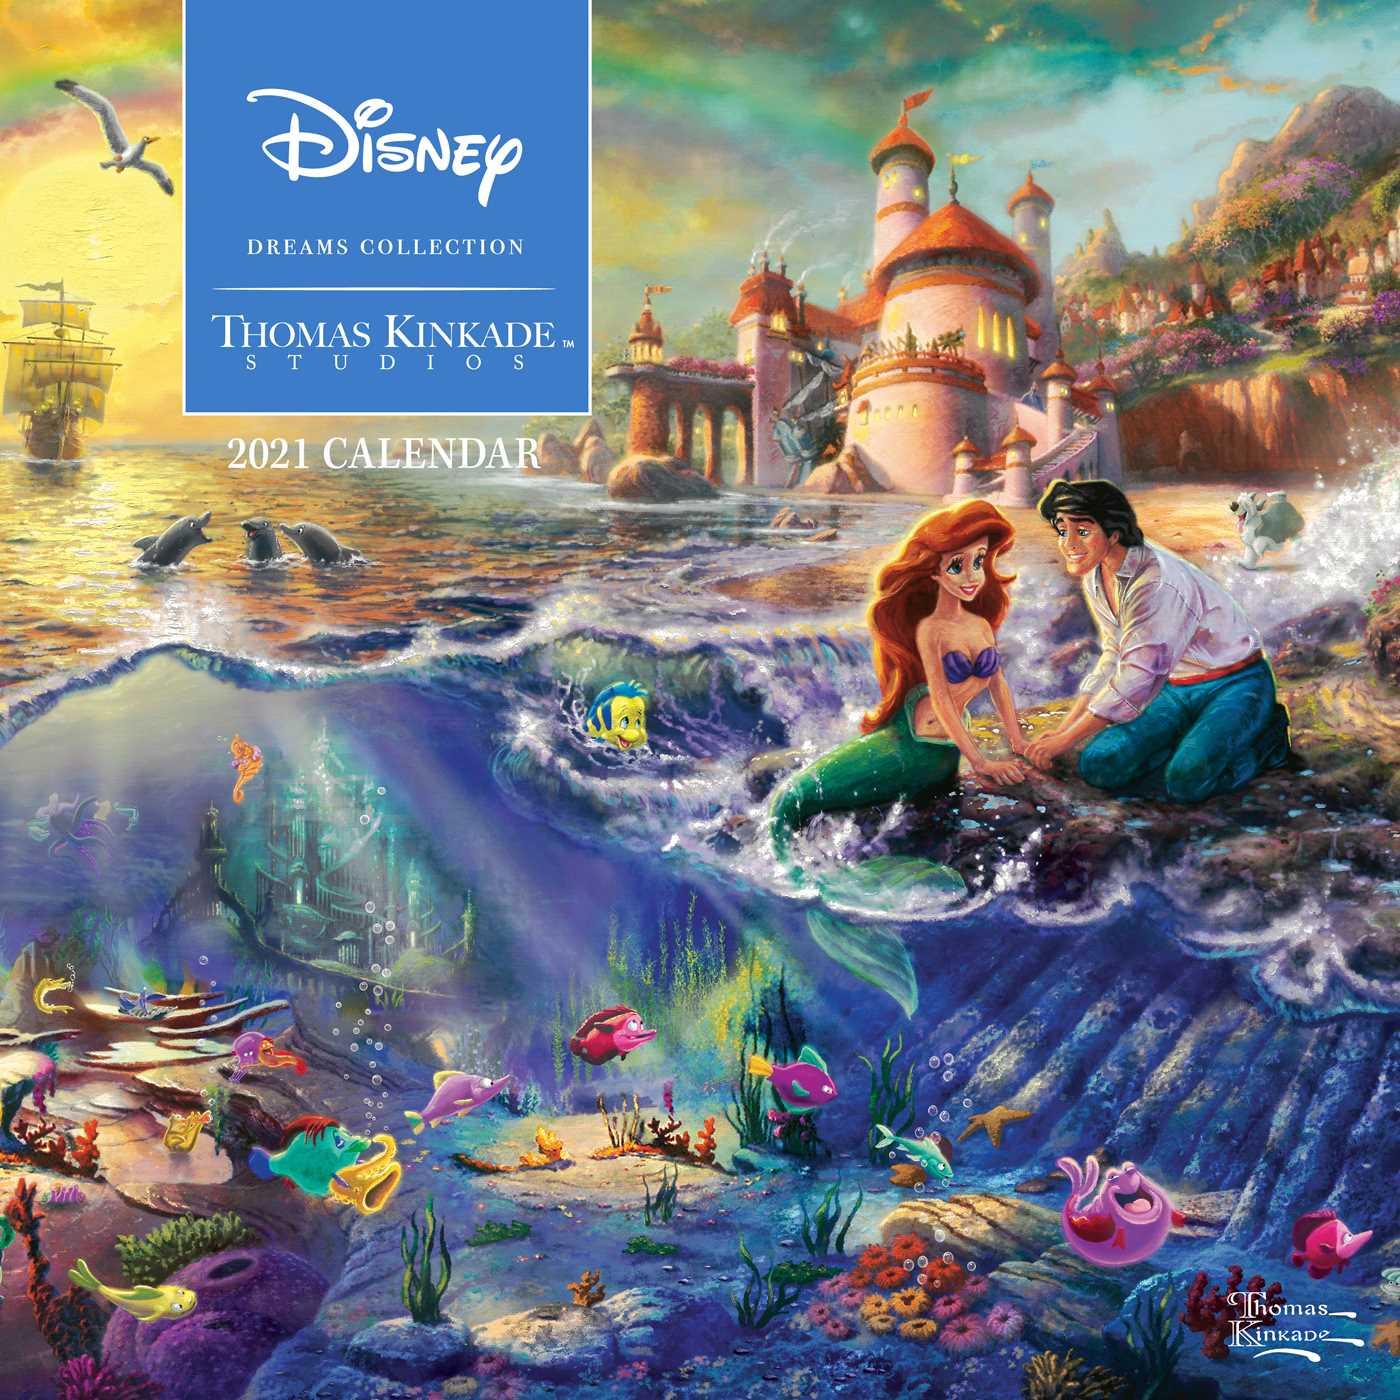 Thomas Kinkade Disney Calendar 2021 Disney Dreams Collection by Thomas Kinkade Studios: 2021 Wall